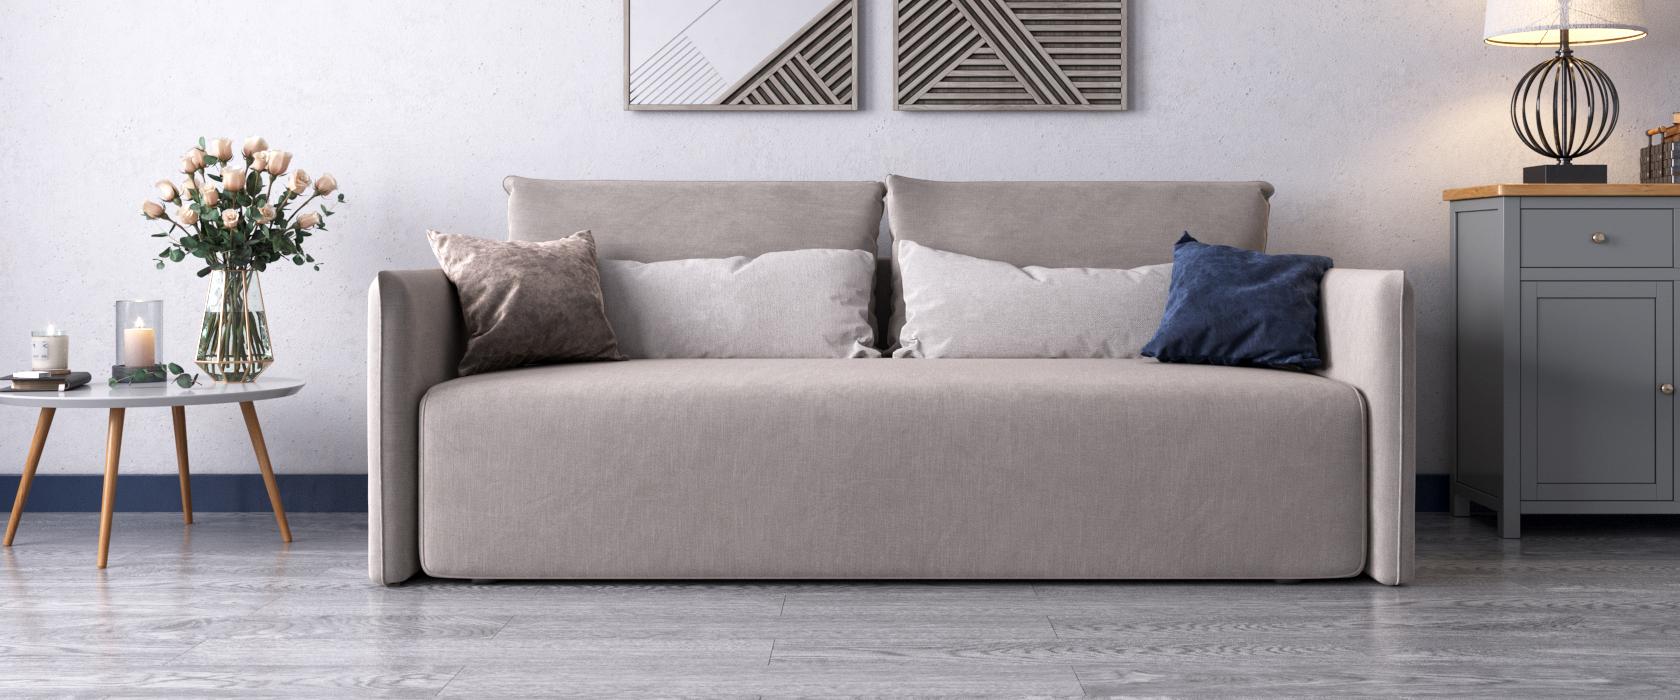 Трехместный диван Laura - Фото 1 - Pufetto